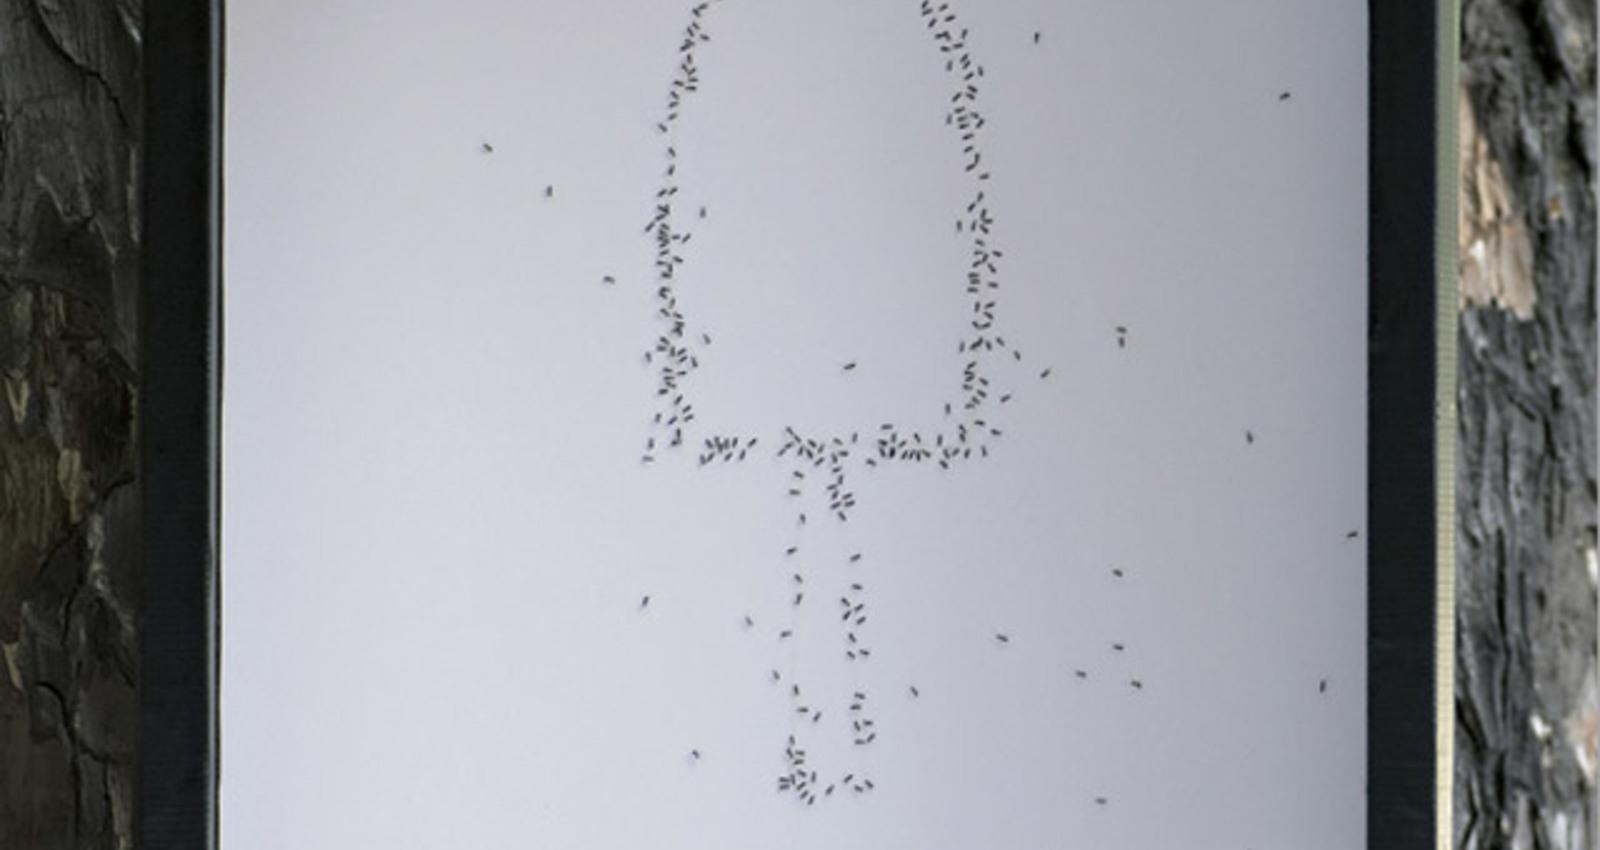 Sugar Free Ants Campaign